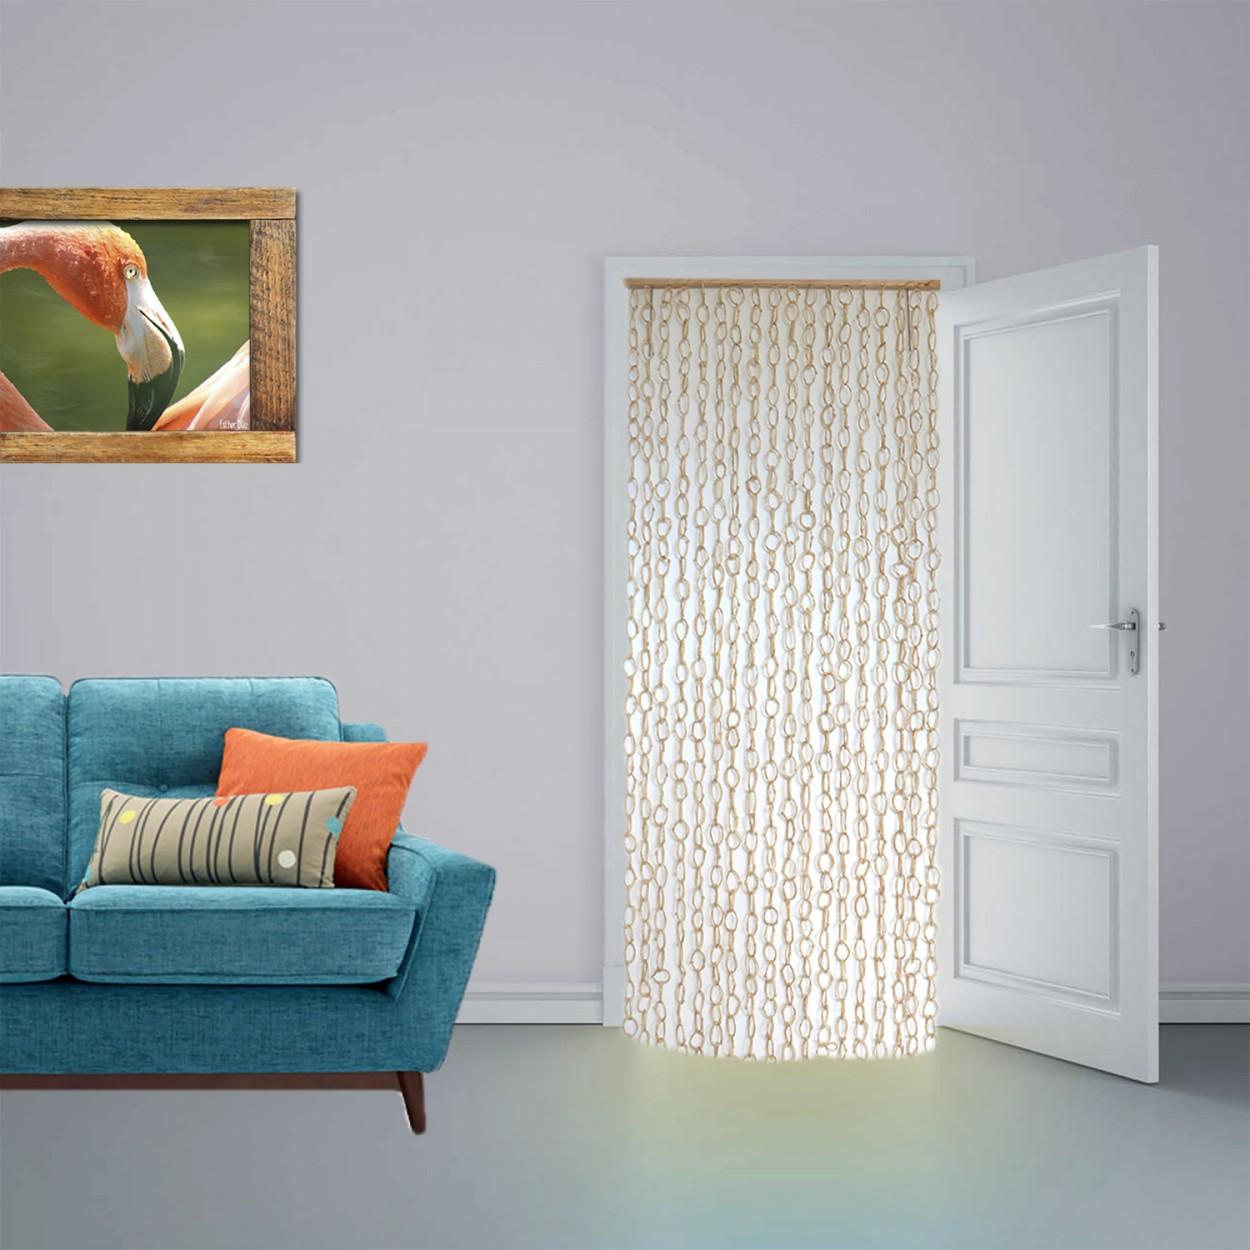 Cortina para puerta de sisal natural y madera aros color for Cortinas de madera para puertas